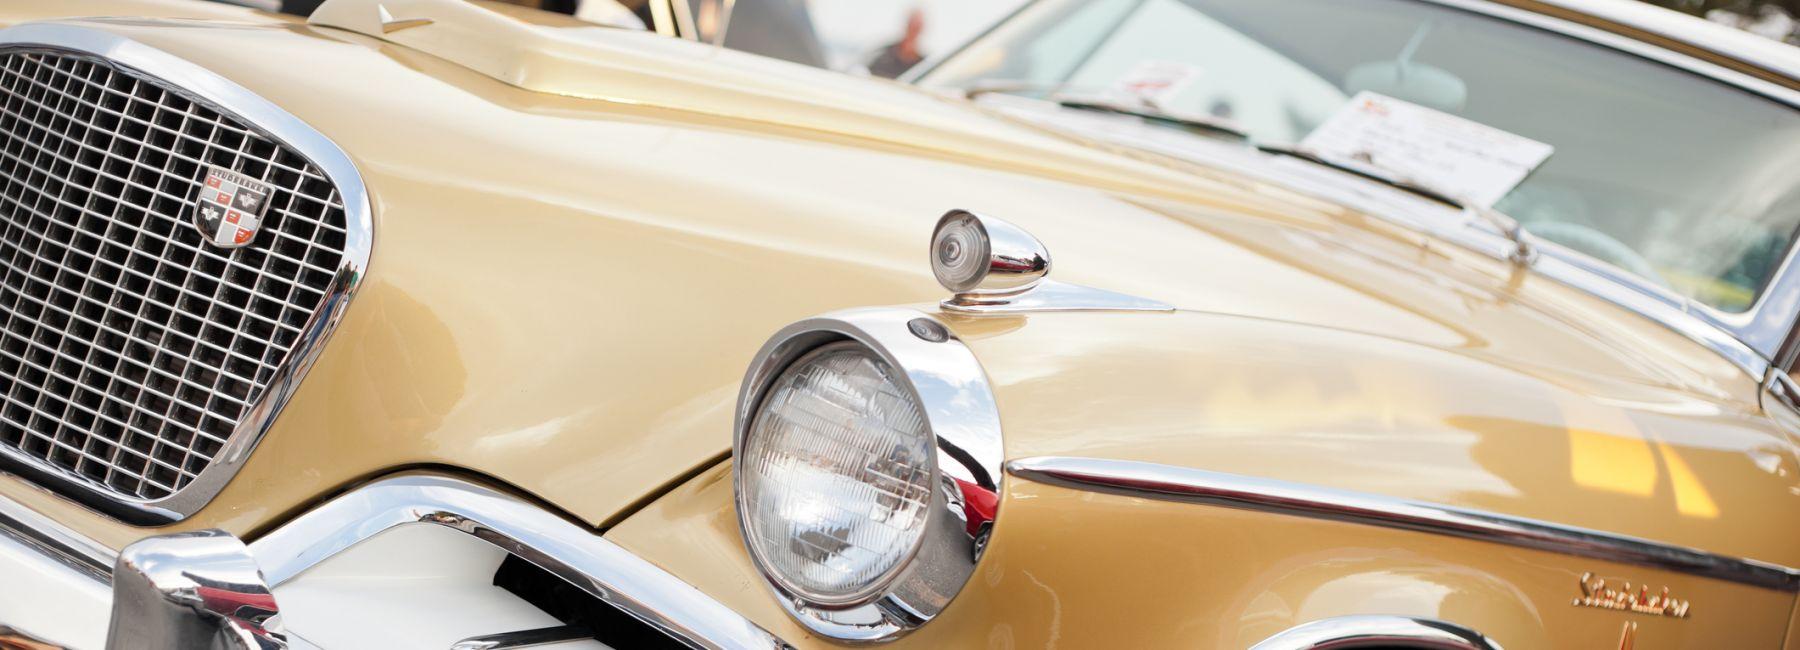 Classic 1957 Studebaker Golden Hawk